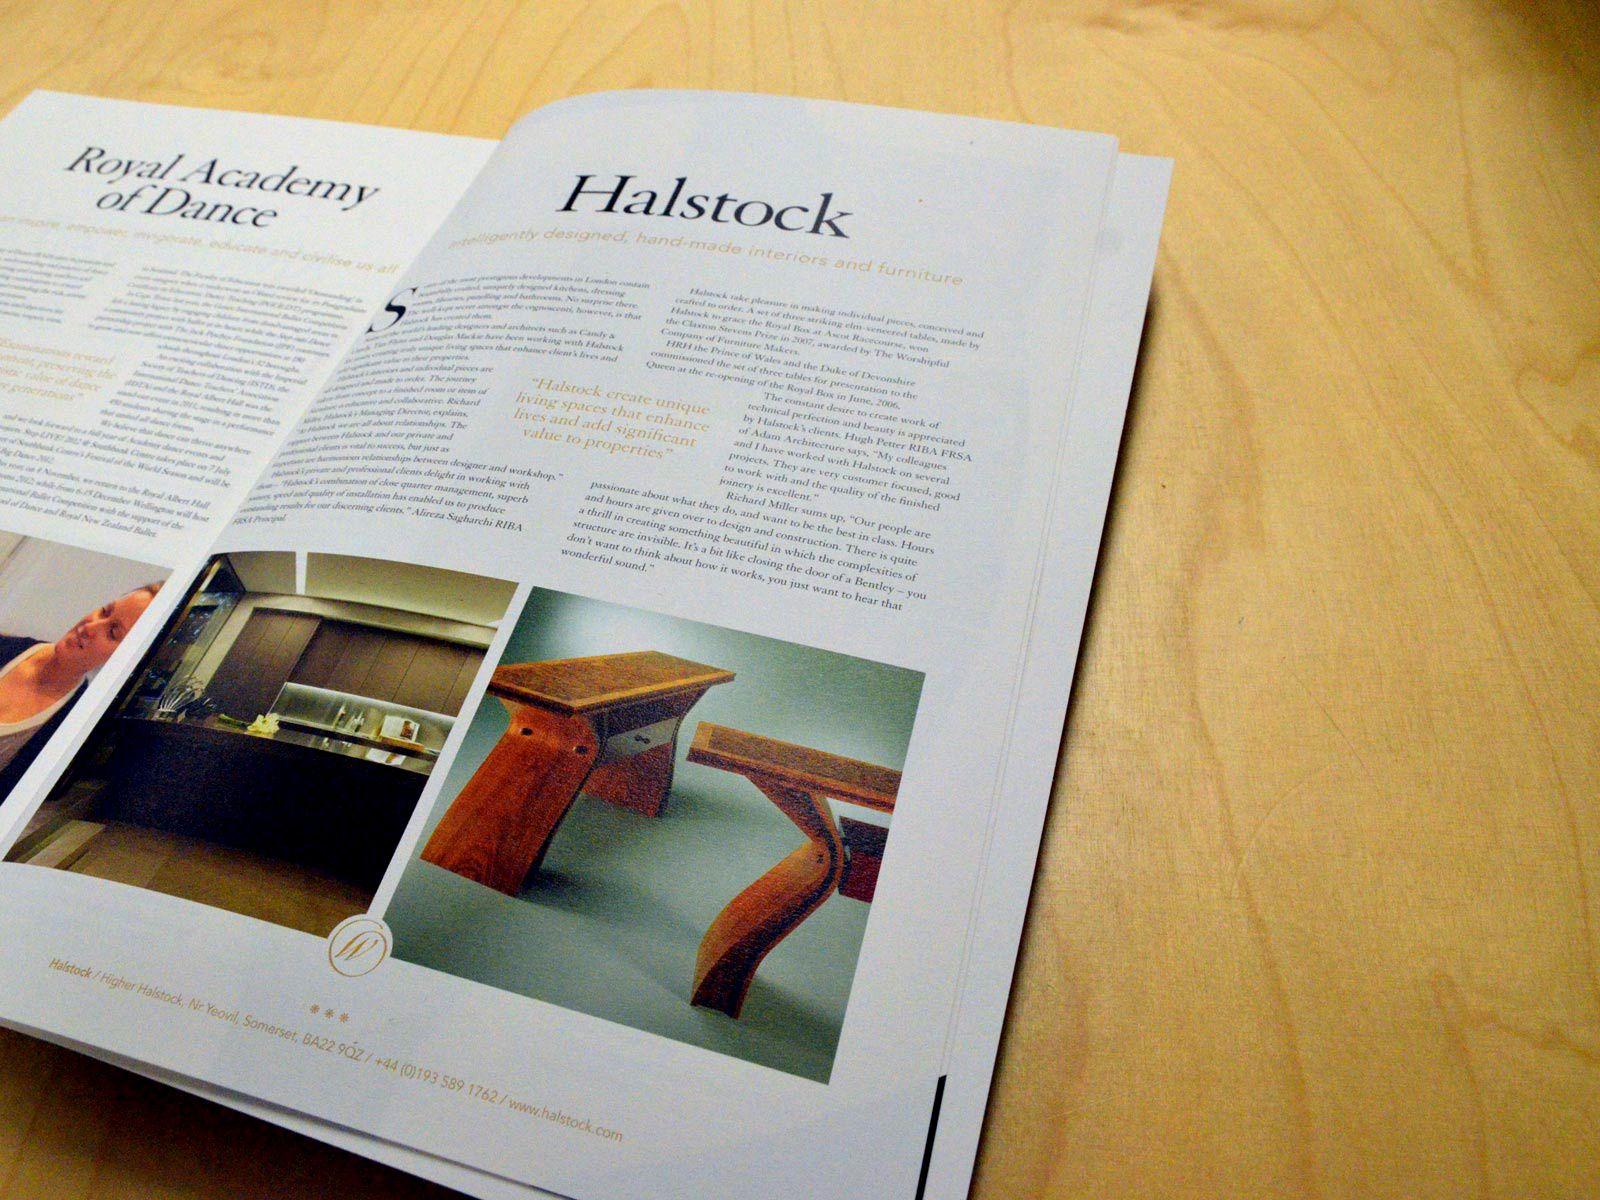 halstock